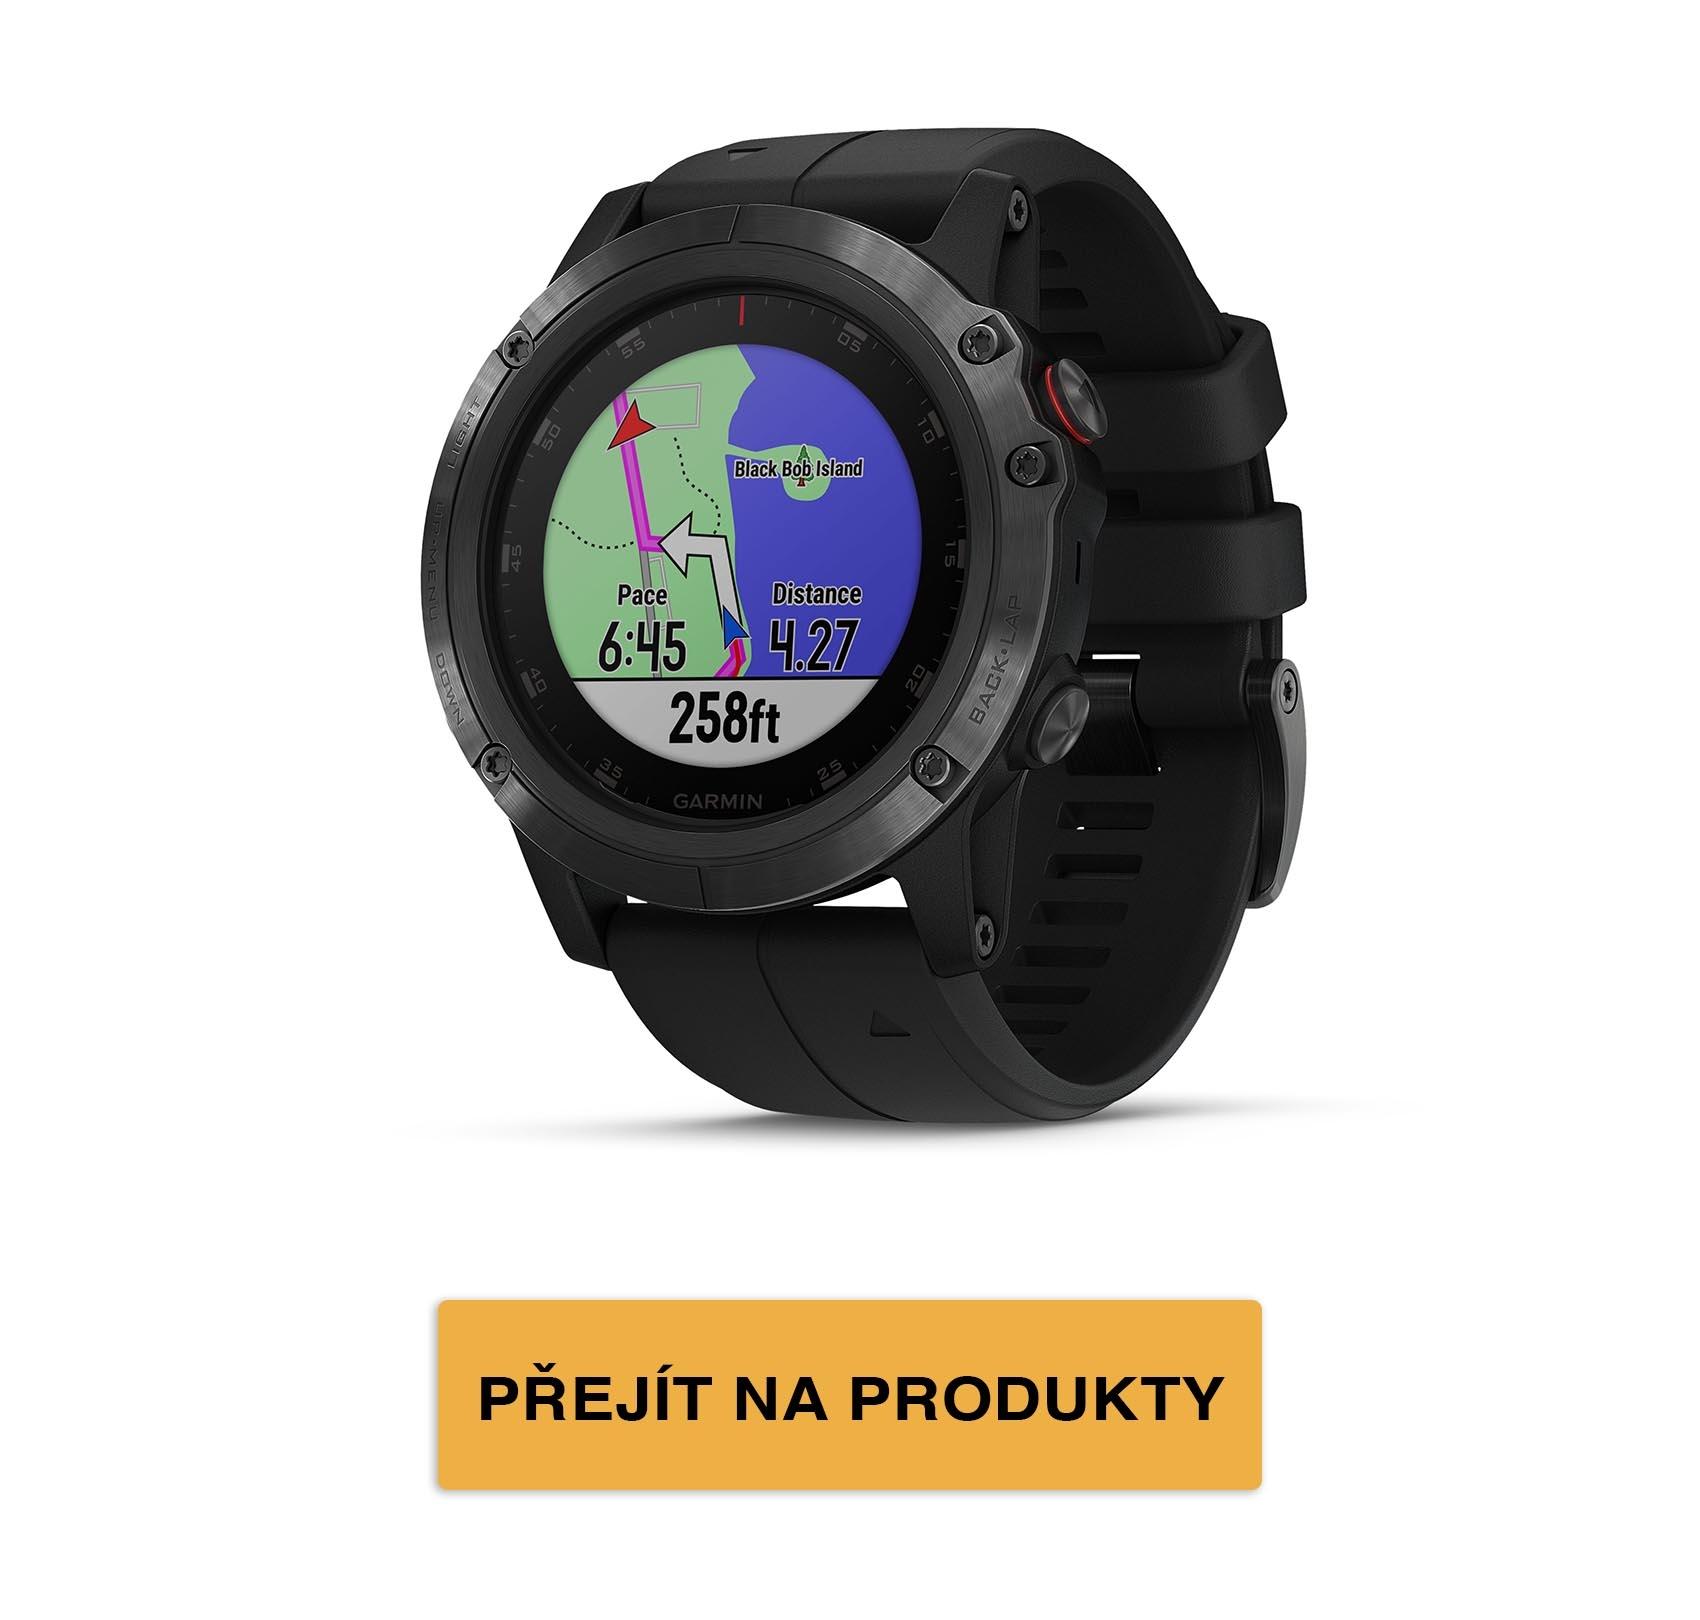 fēnix5 Optic Plus - mapa